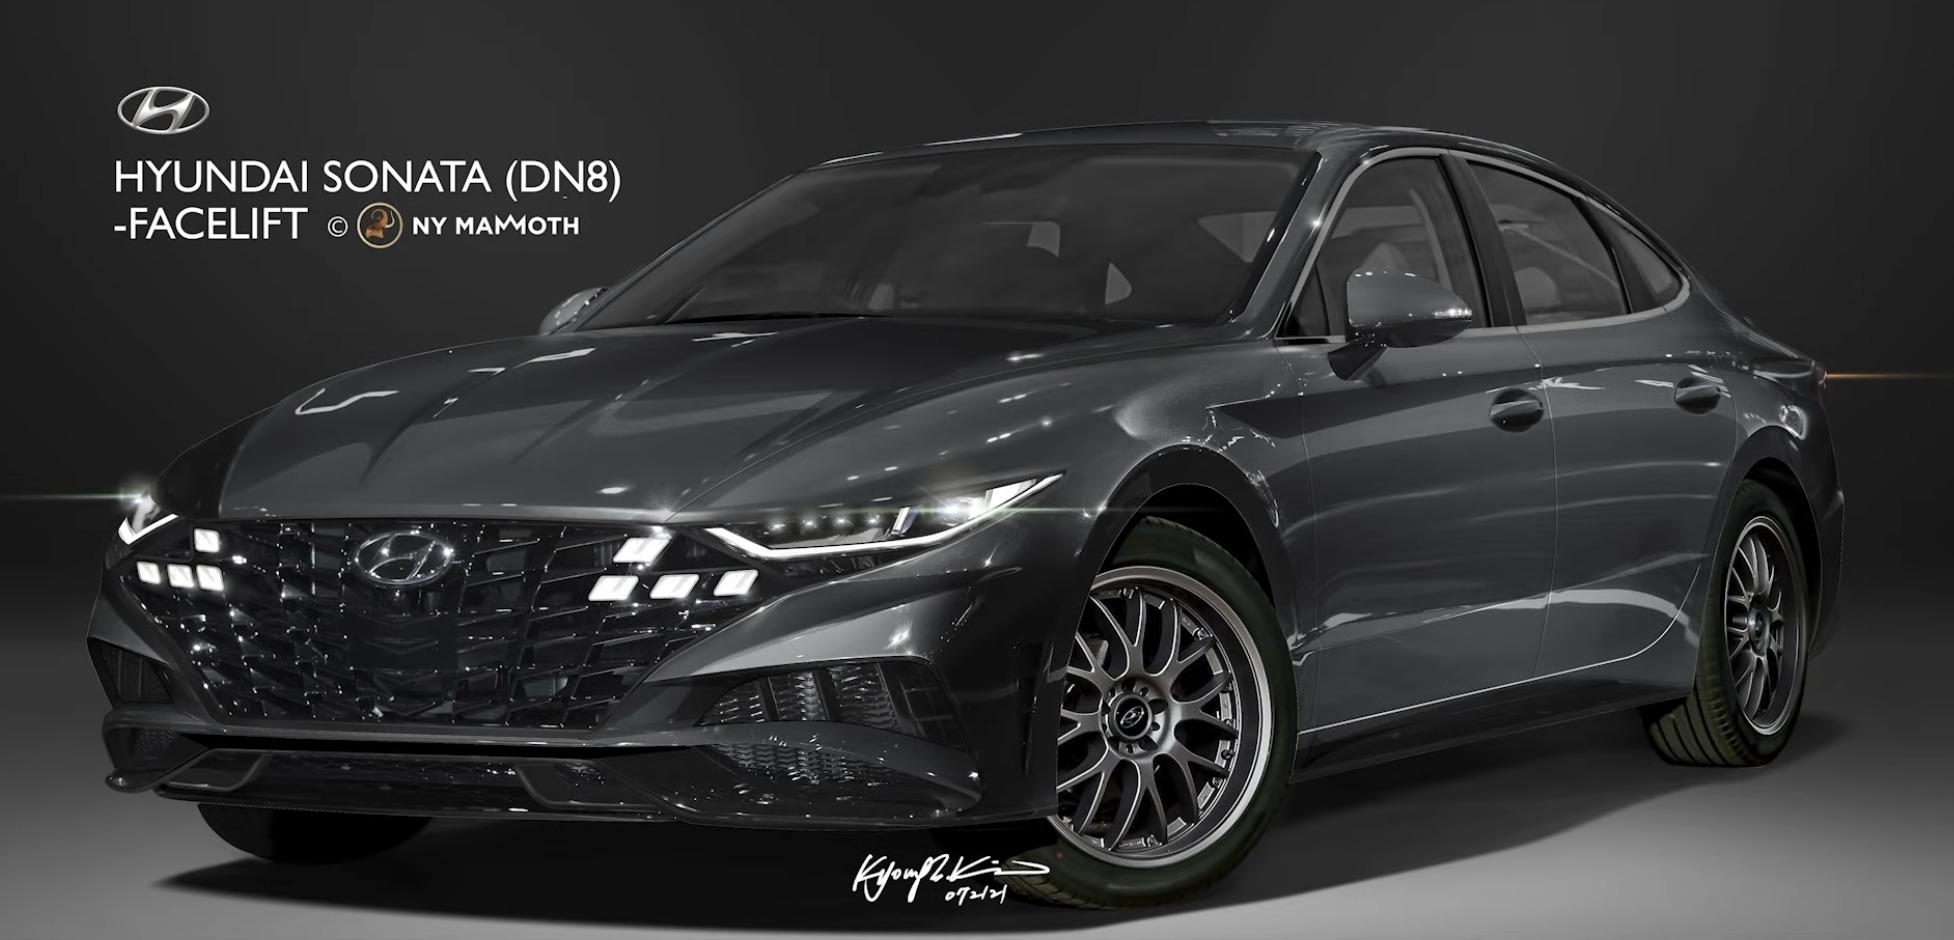 hyundai sonata facelift rendering